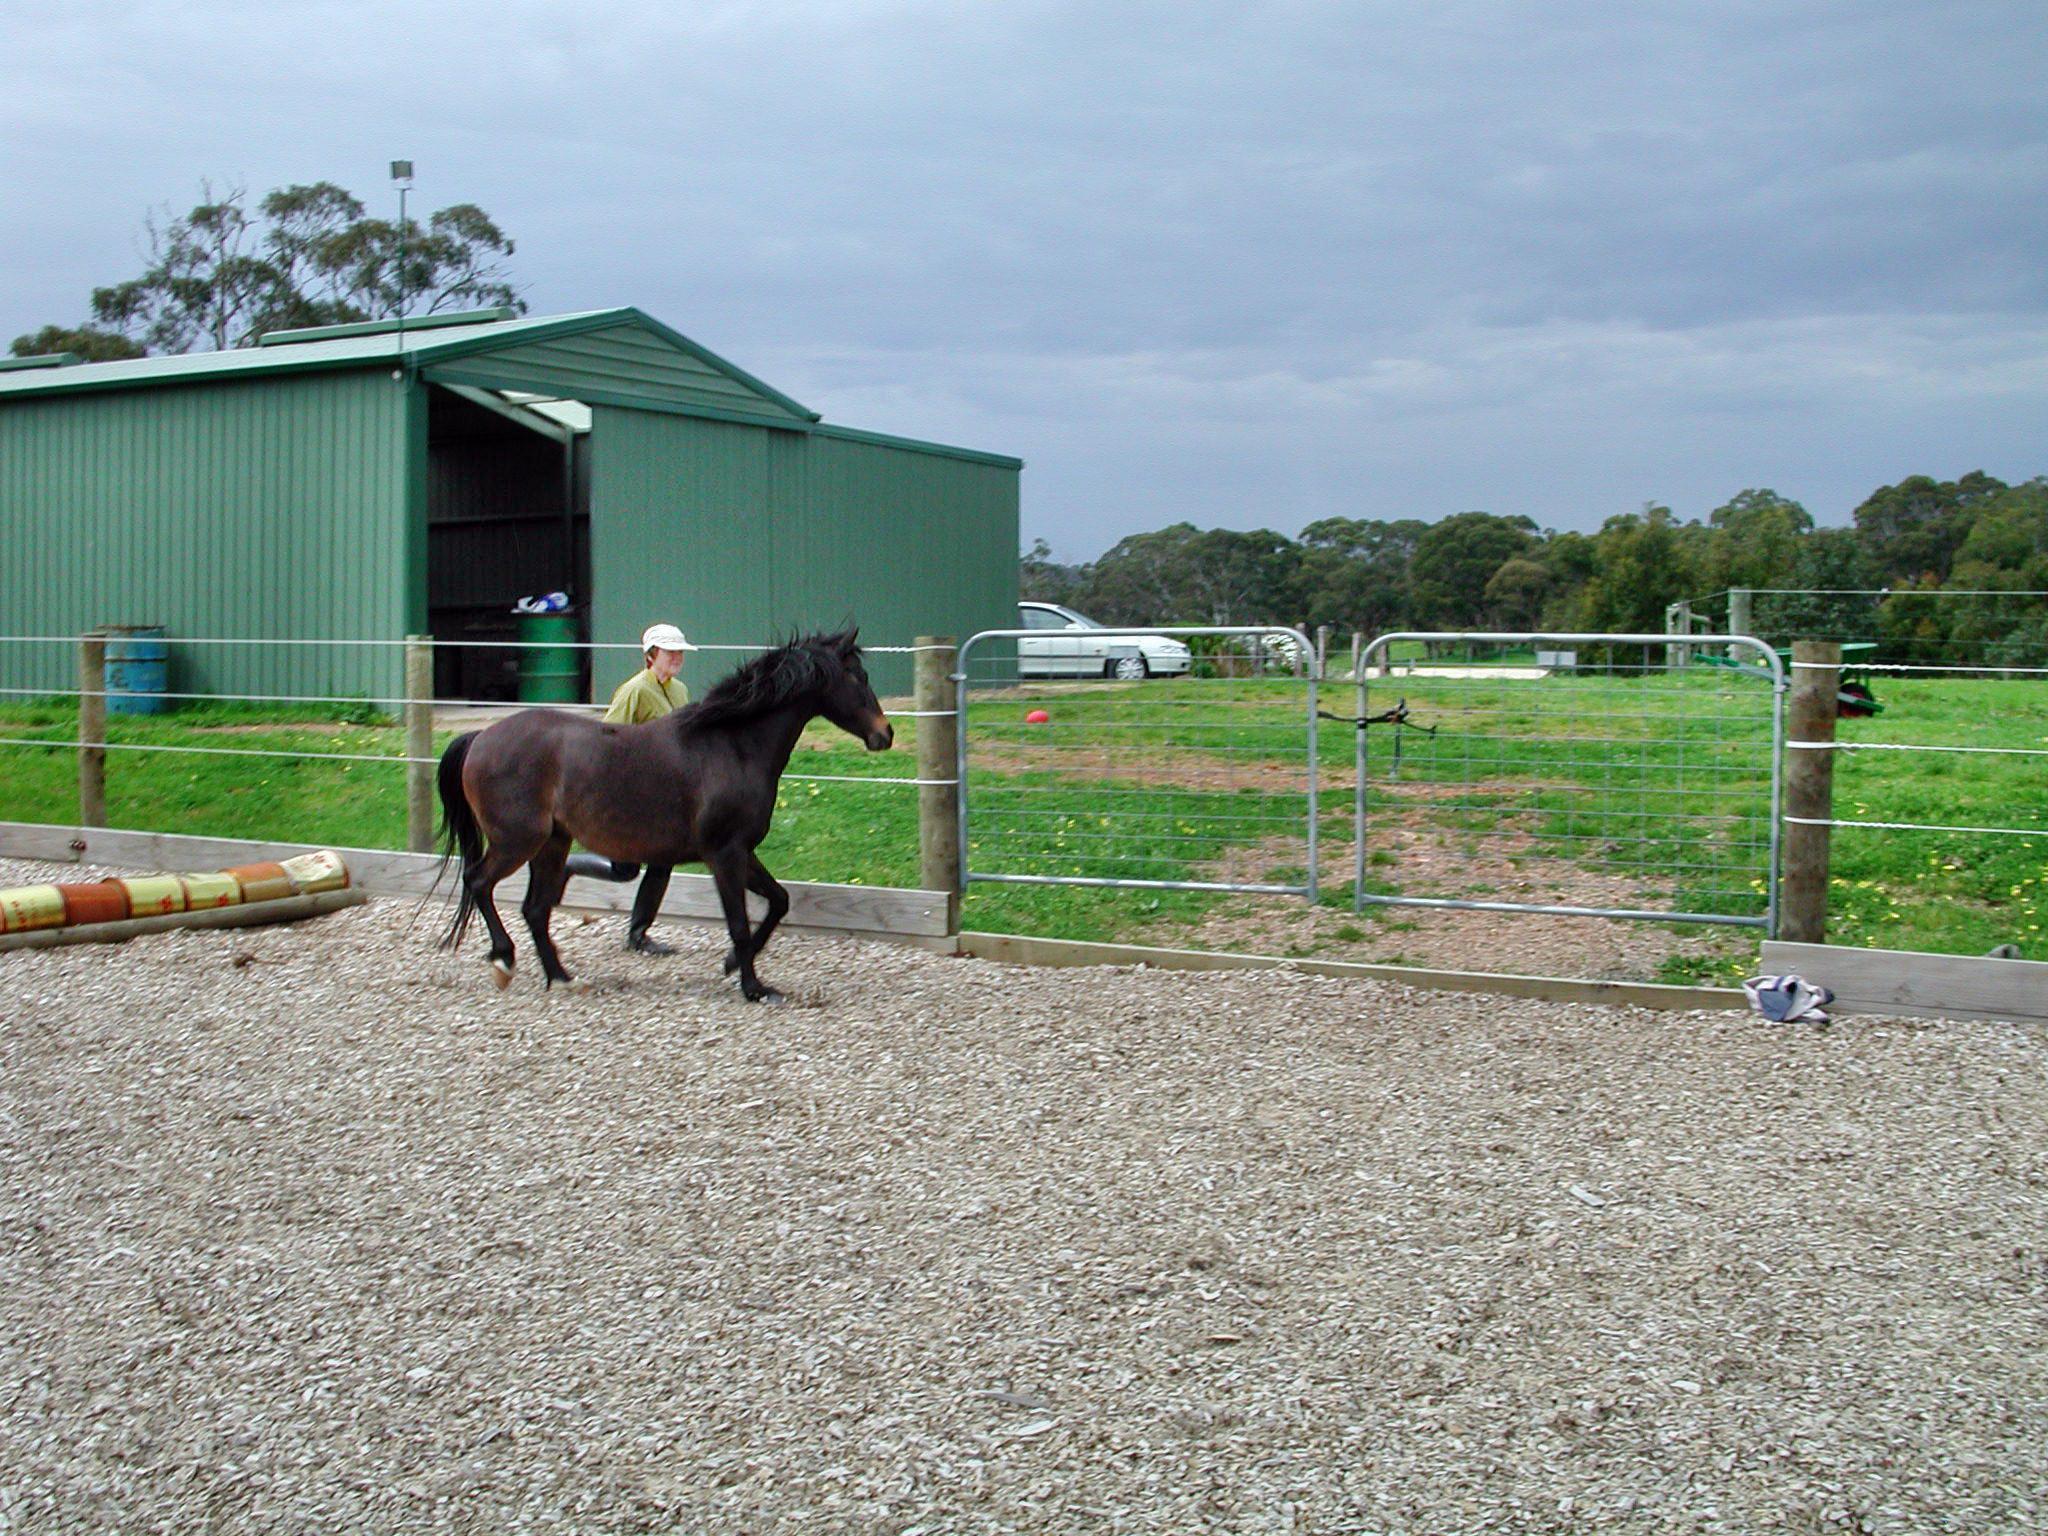 Horses-19.jpeg